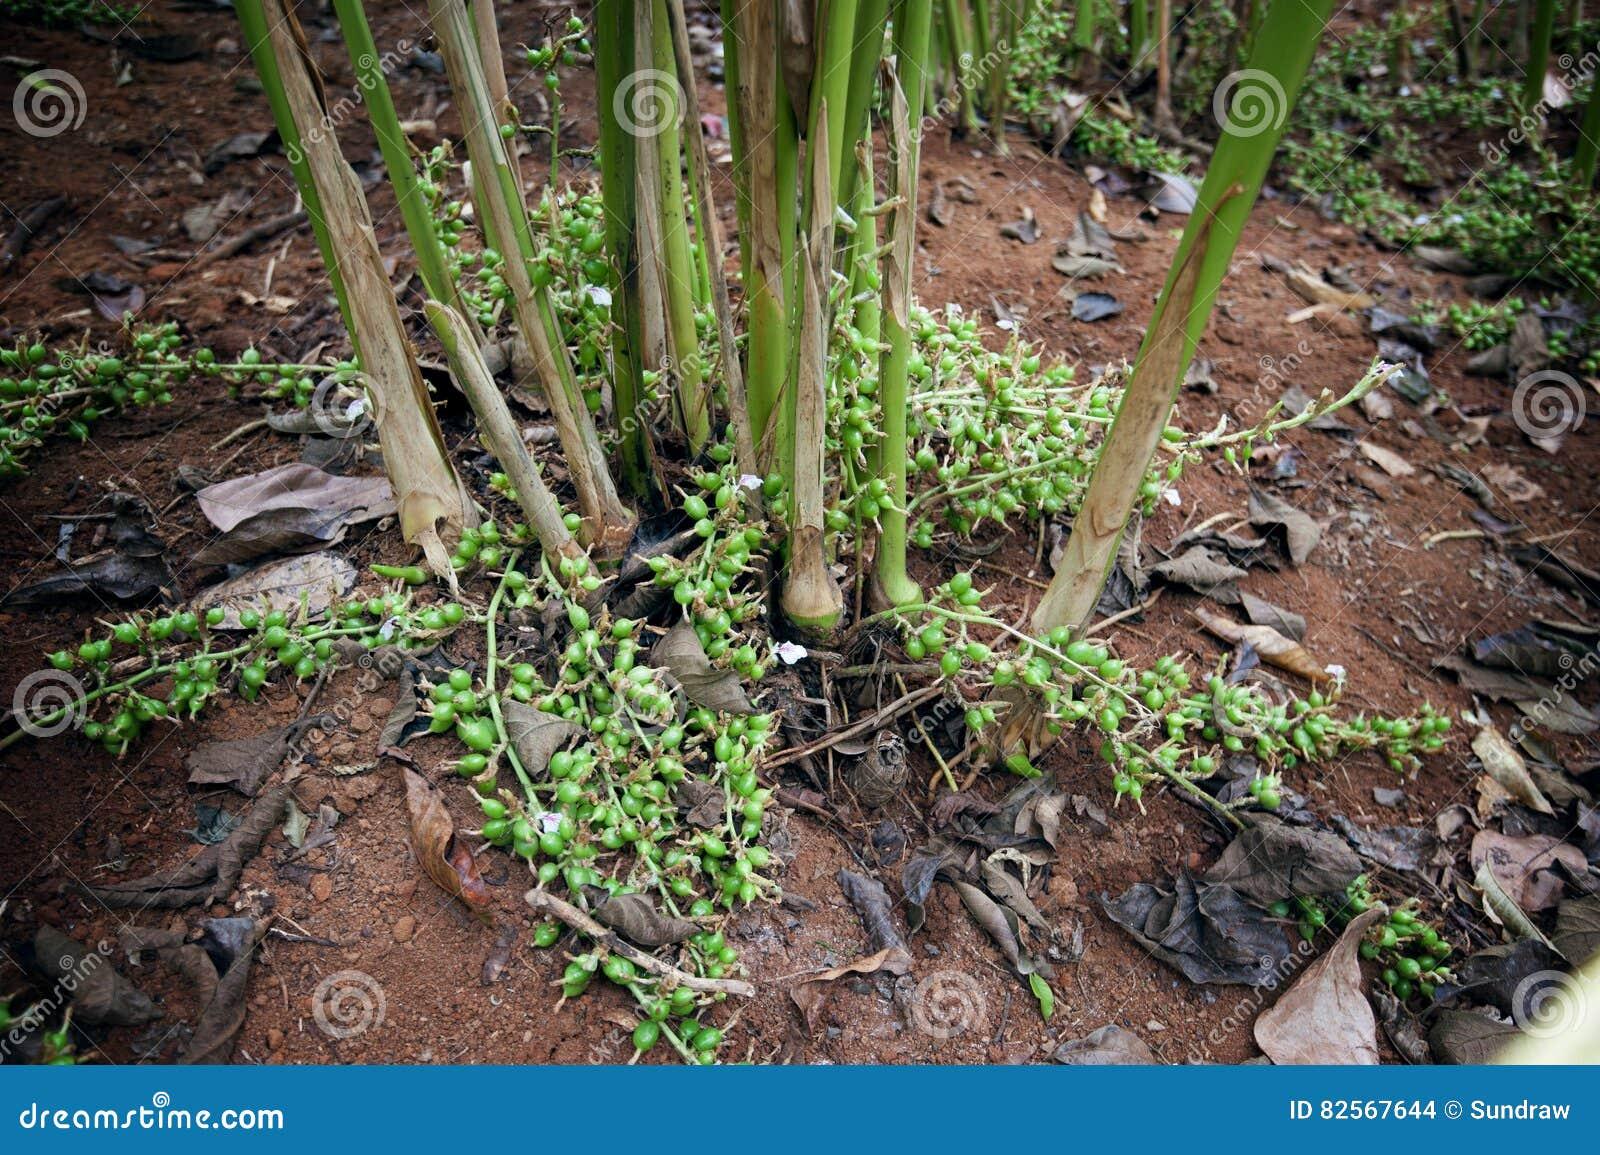 Cardamom plants growing at Cardamom Hills